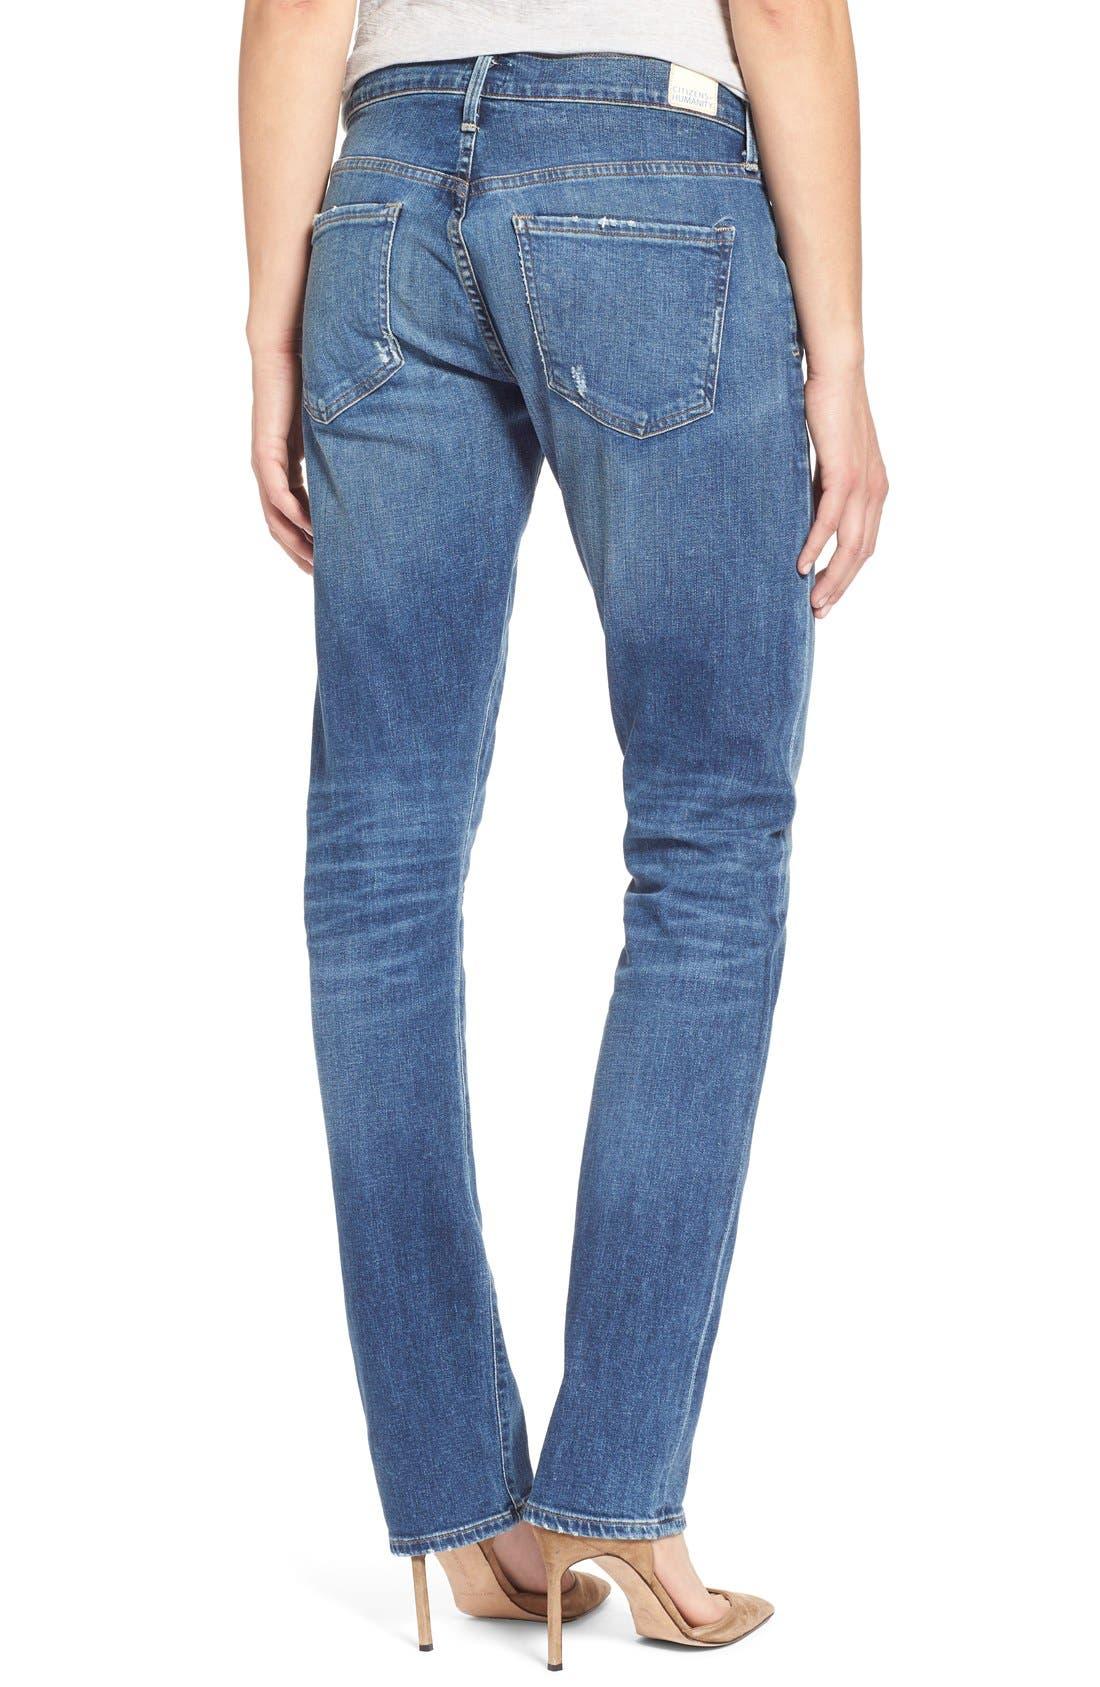 'Emerson Long' Slim Boyfriend Jeans,                             Alternate thumbnail 2, color,                             Blue Mountain